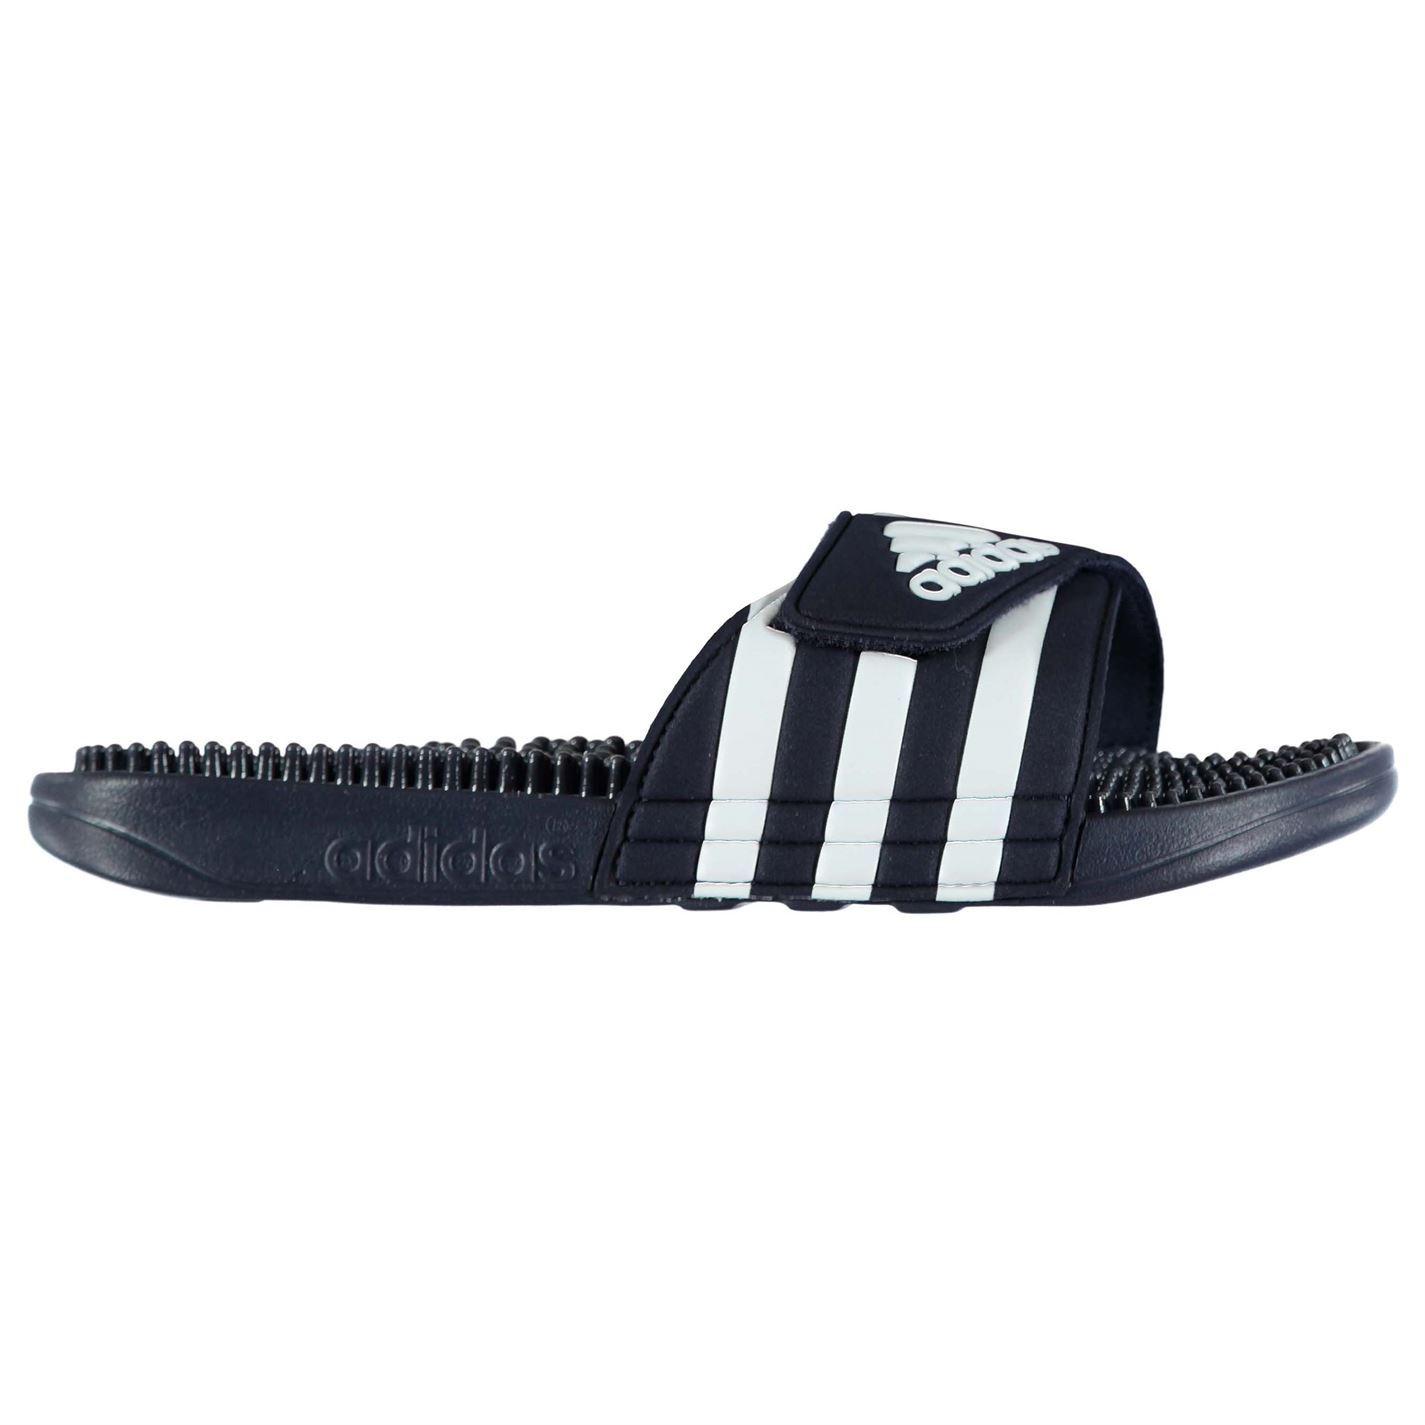 adidas Mens Adissage Slides Sandals Massage Footbed Summer Shoes Footwear